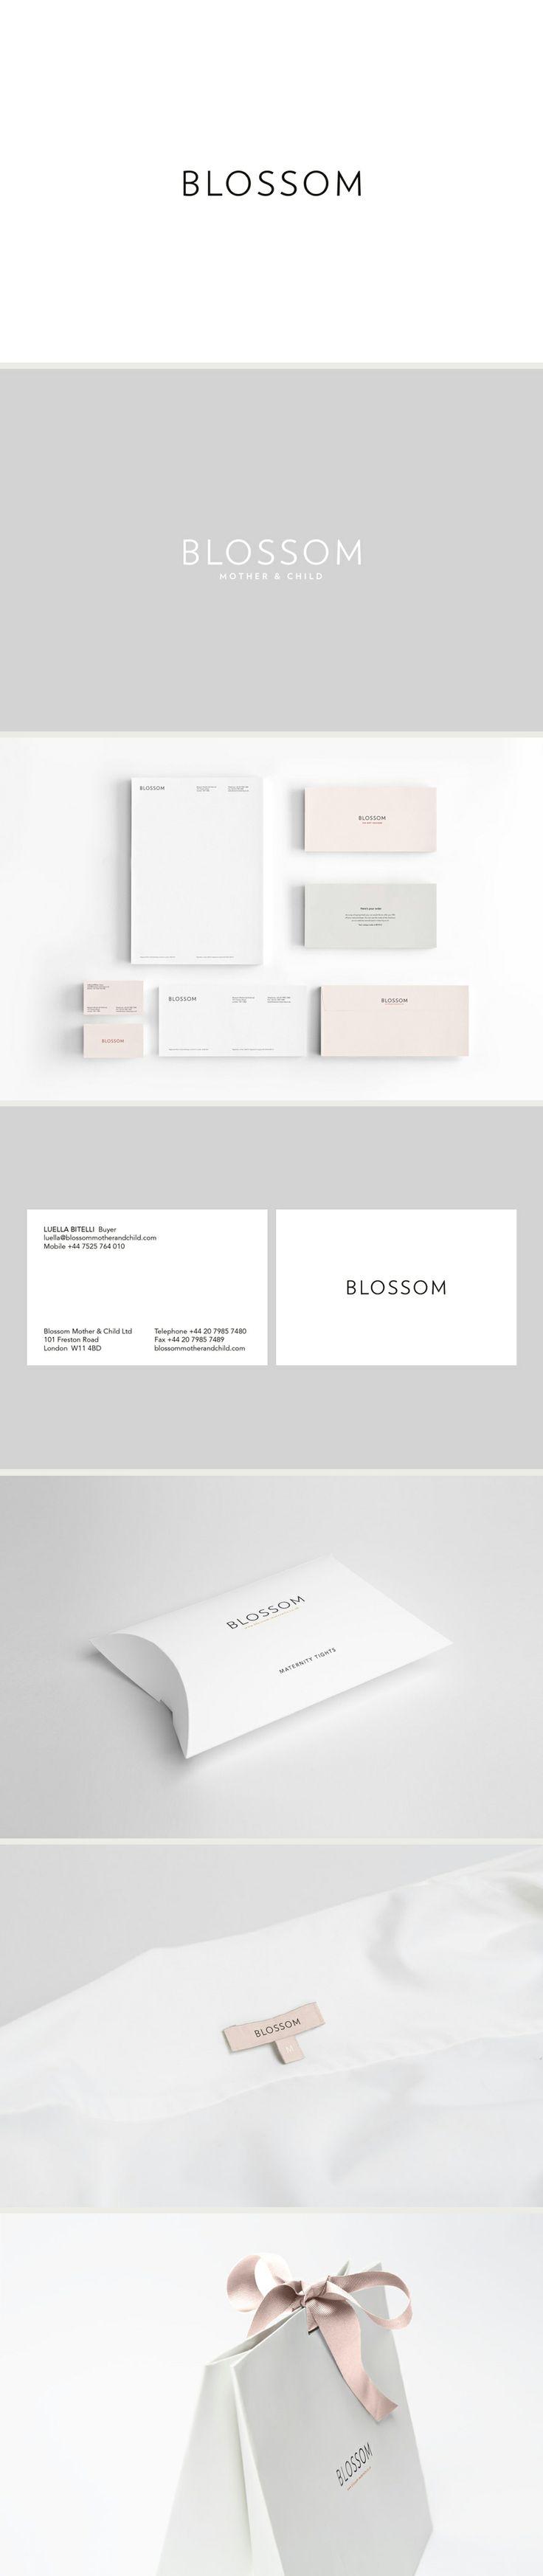 Branding / Identity / Graphic Design / Blossom Brand Identity by Reef Design